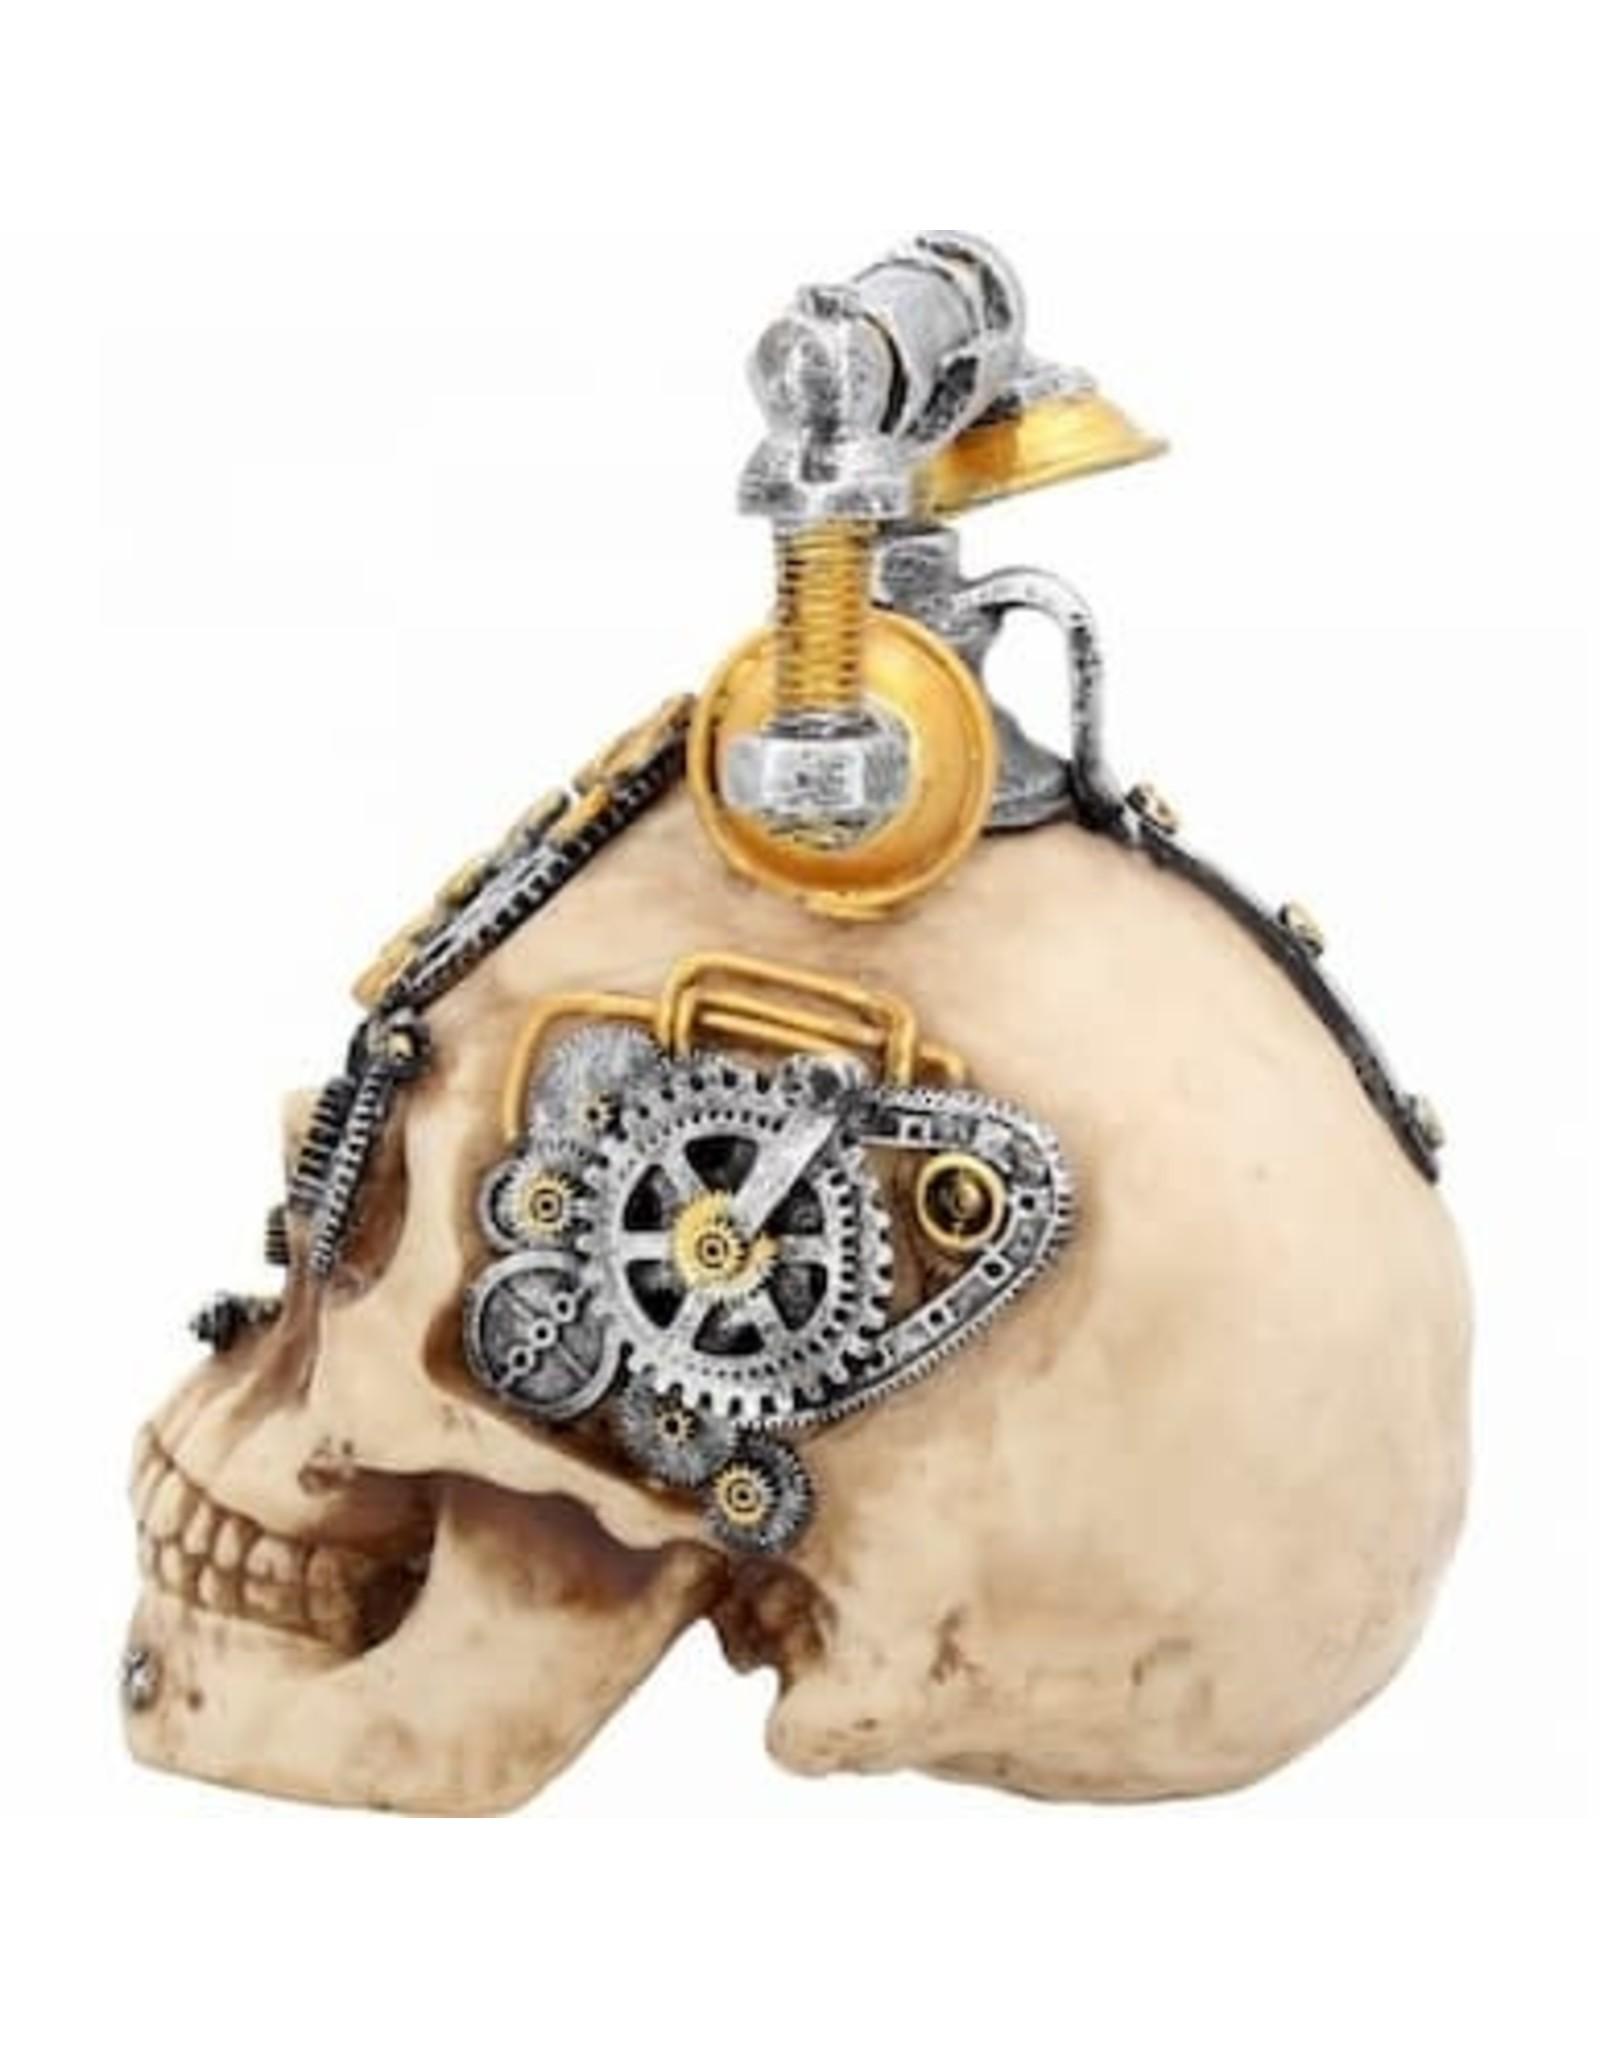 Alator Schedels - Schedel Steampunk Dead Ringer Nemesis Now